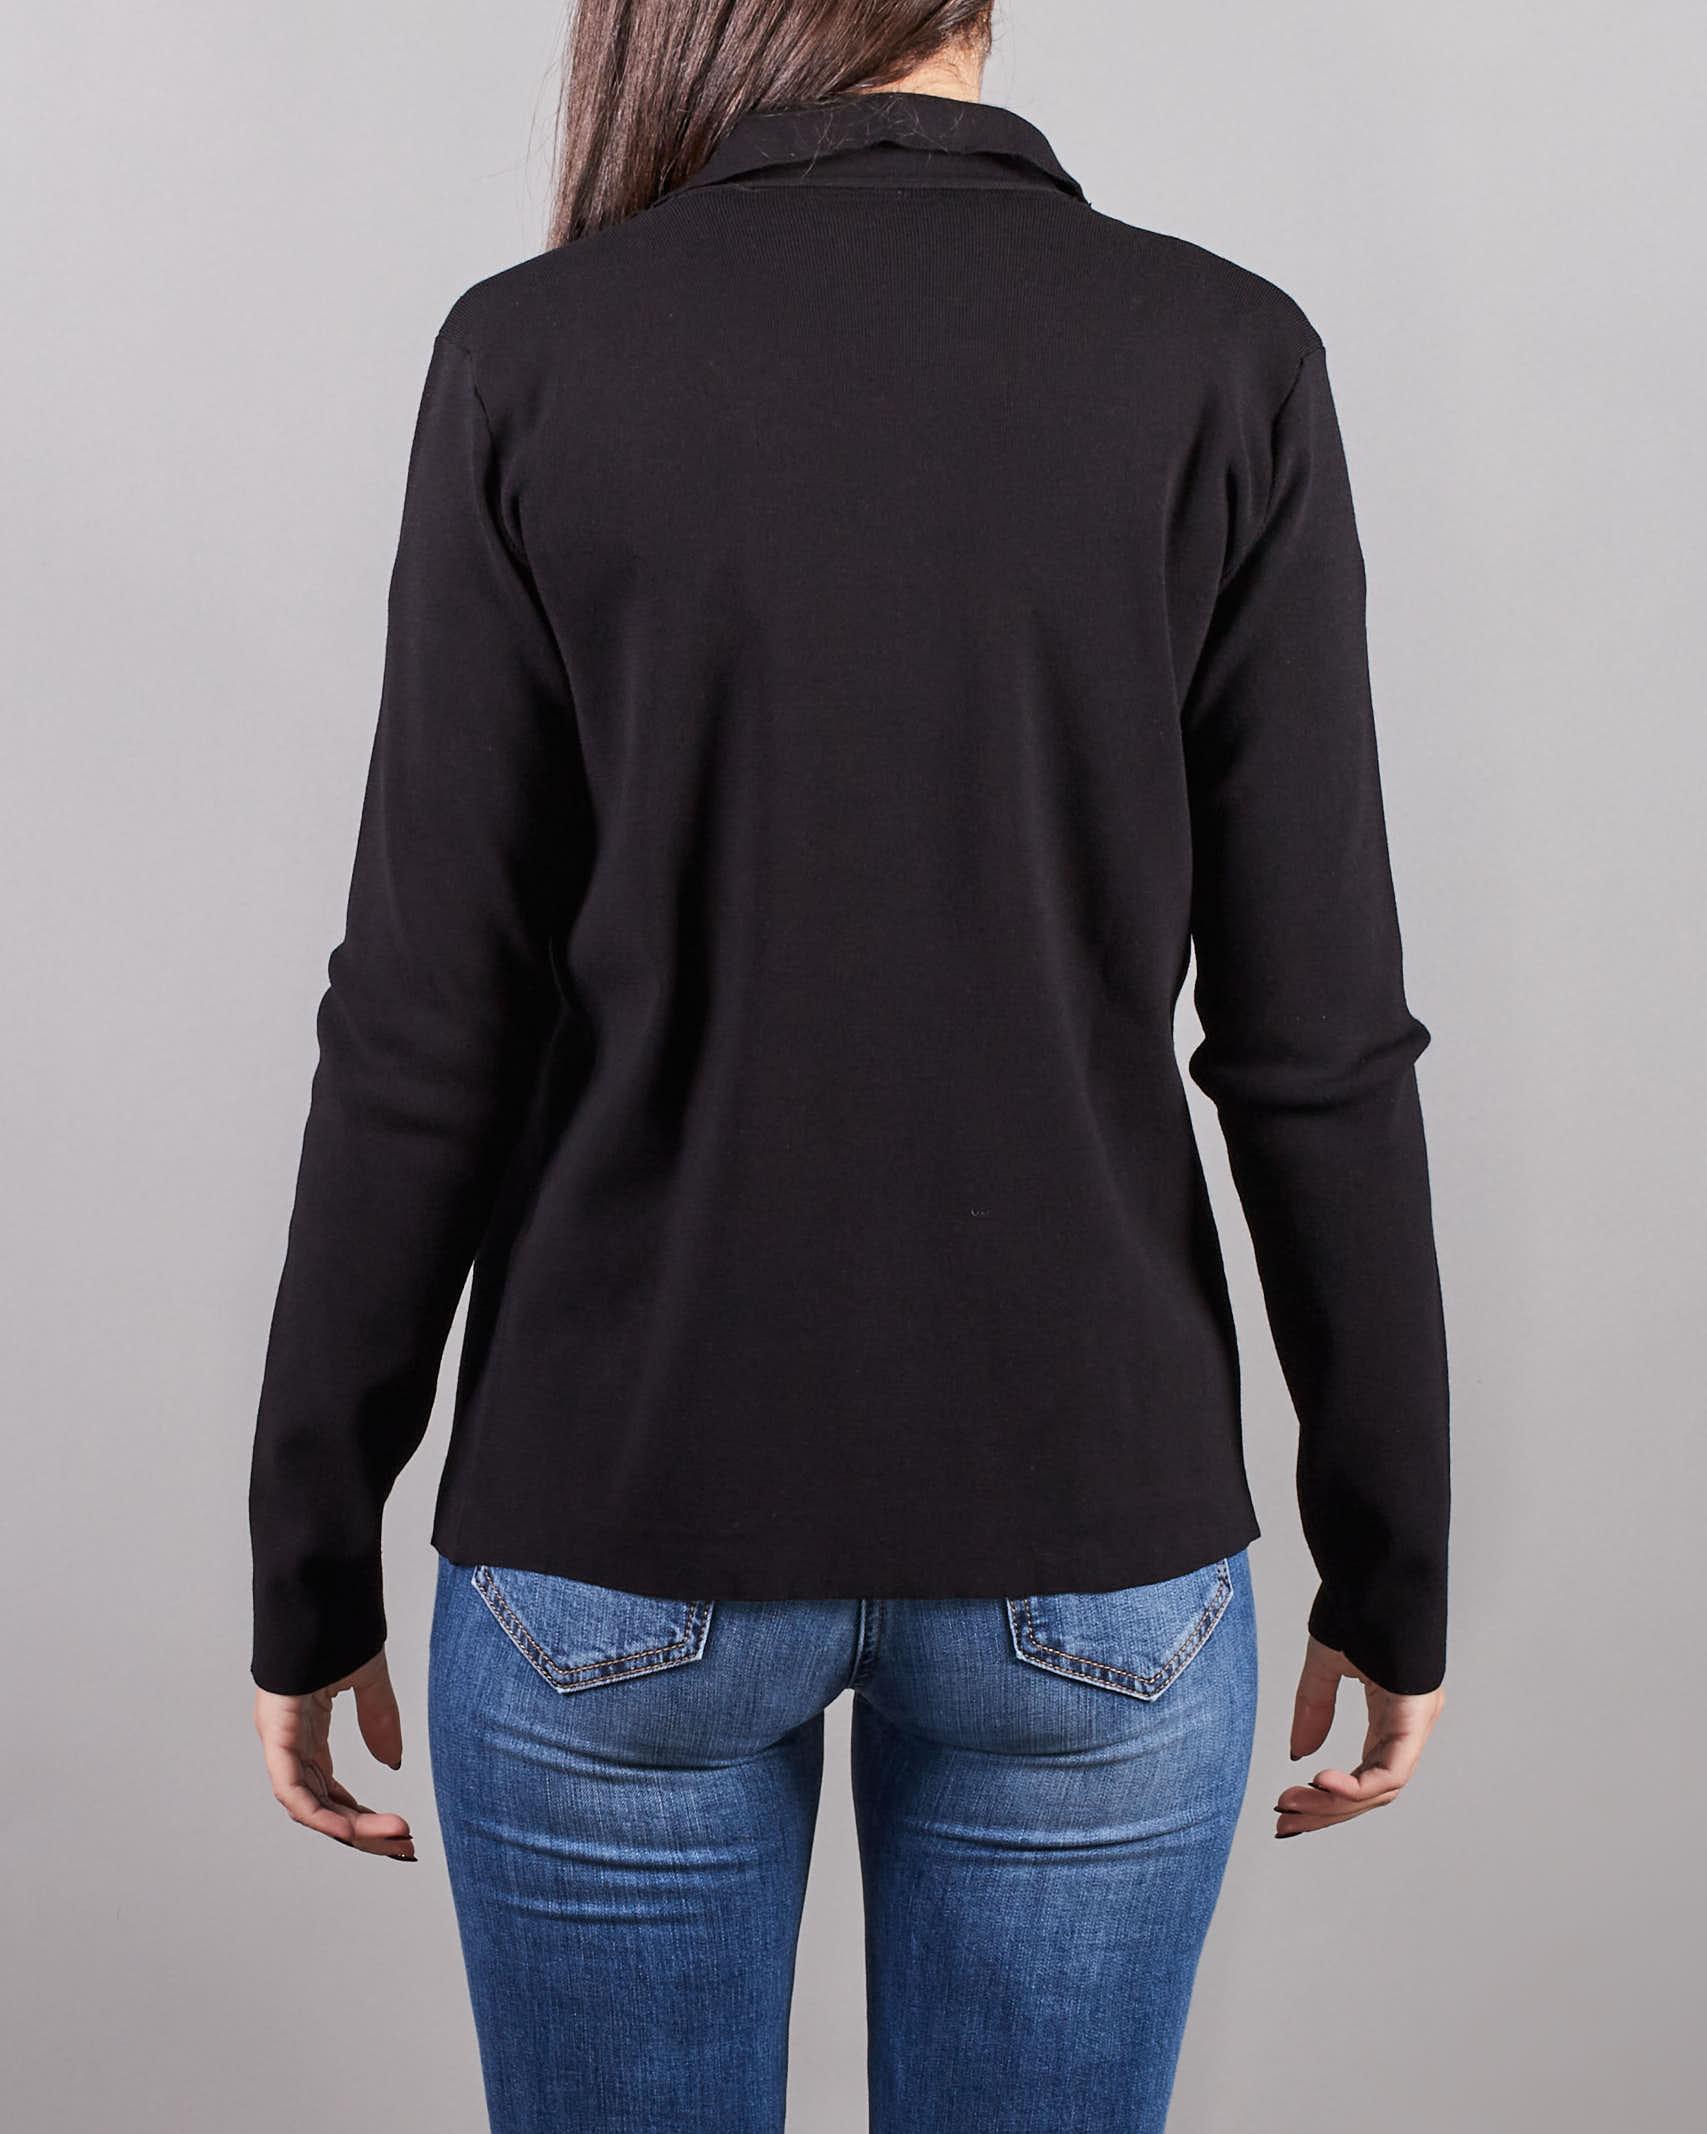 Cardigan modello giacca Manila Grace MANILA GRACE   Cardigan   M389VIMA001